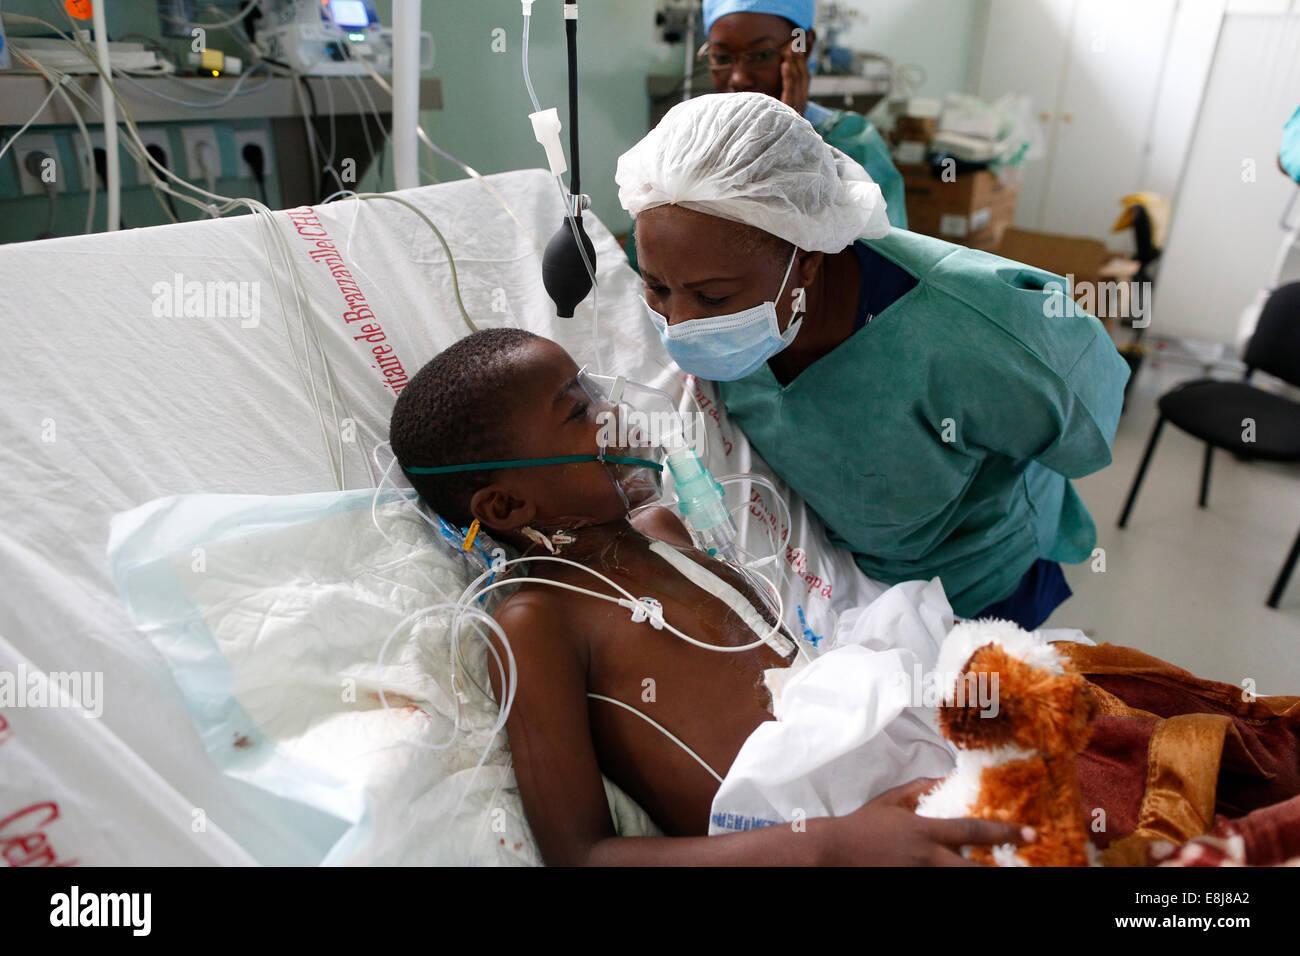 Brazzaville Hospital. Intensive care unit. - Stock Image